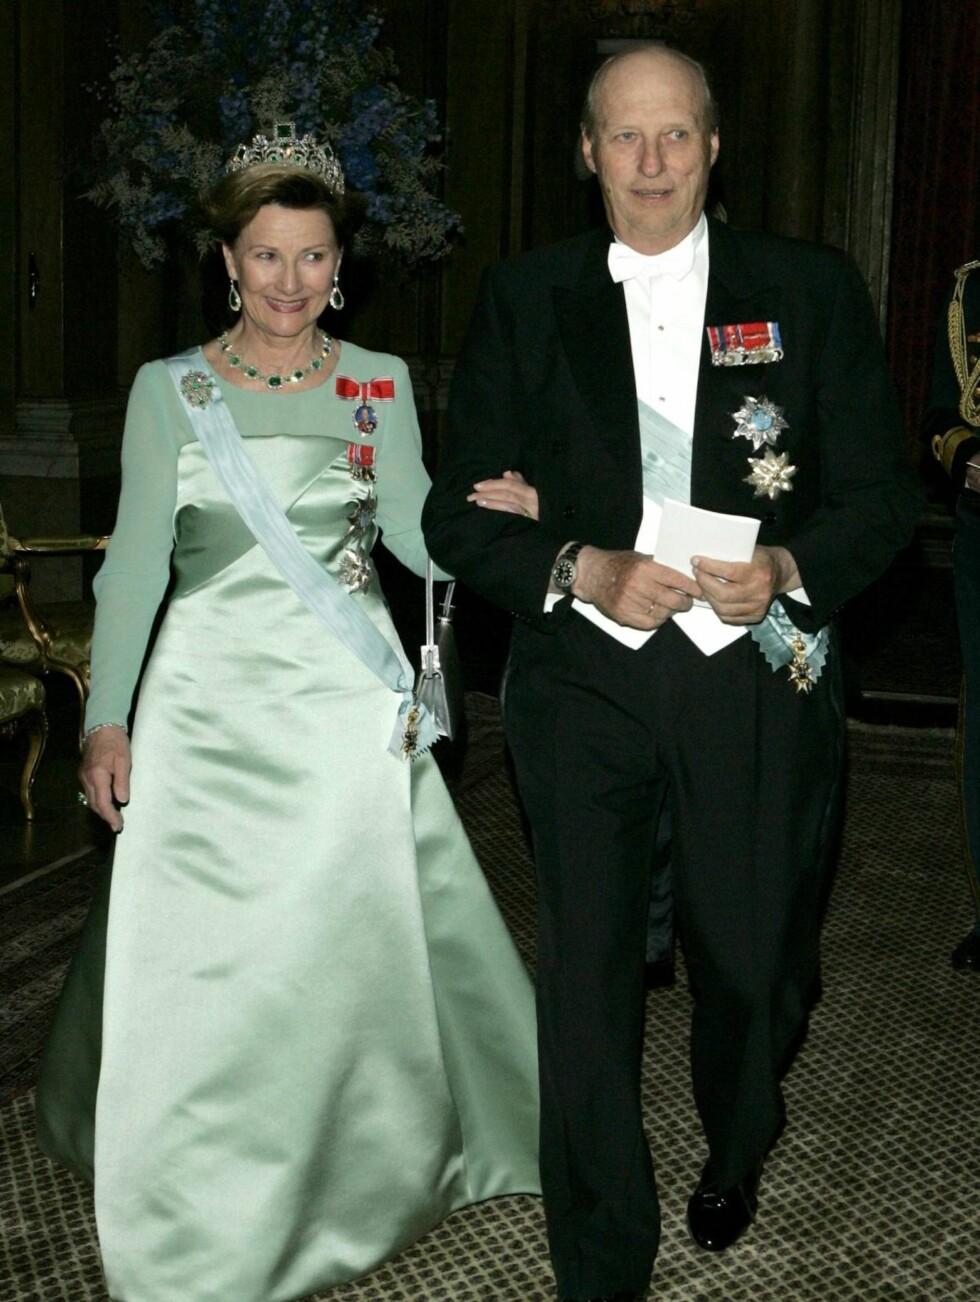 <strong>NORSKE GJESTER:</strong> Kong Harald og Dronning Sonja er blant de mange kongelige gjestene i bryllupet, men de eneste fra Norge som får overvære vielsen. Foto: All Over Press